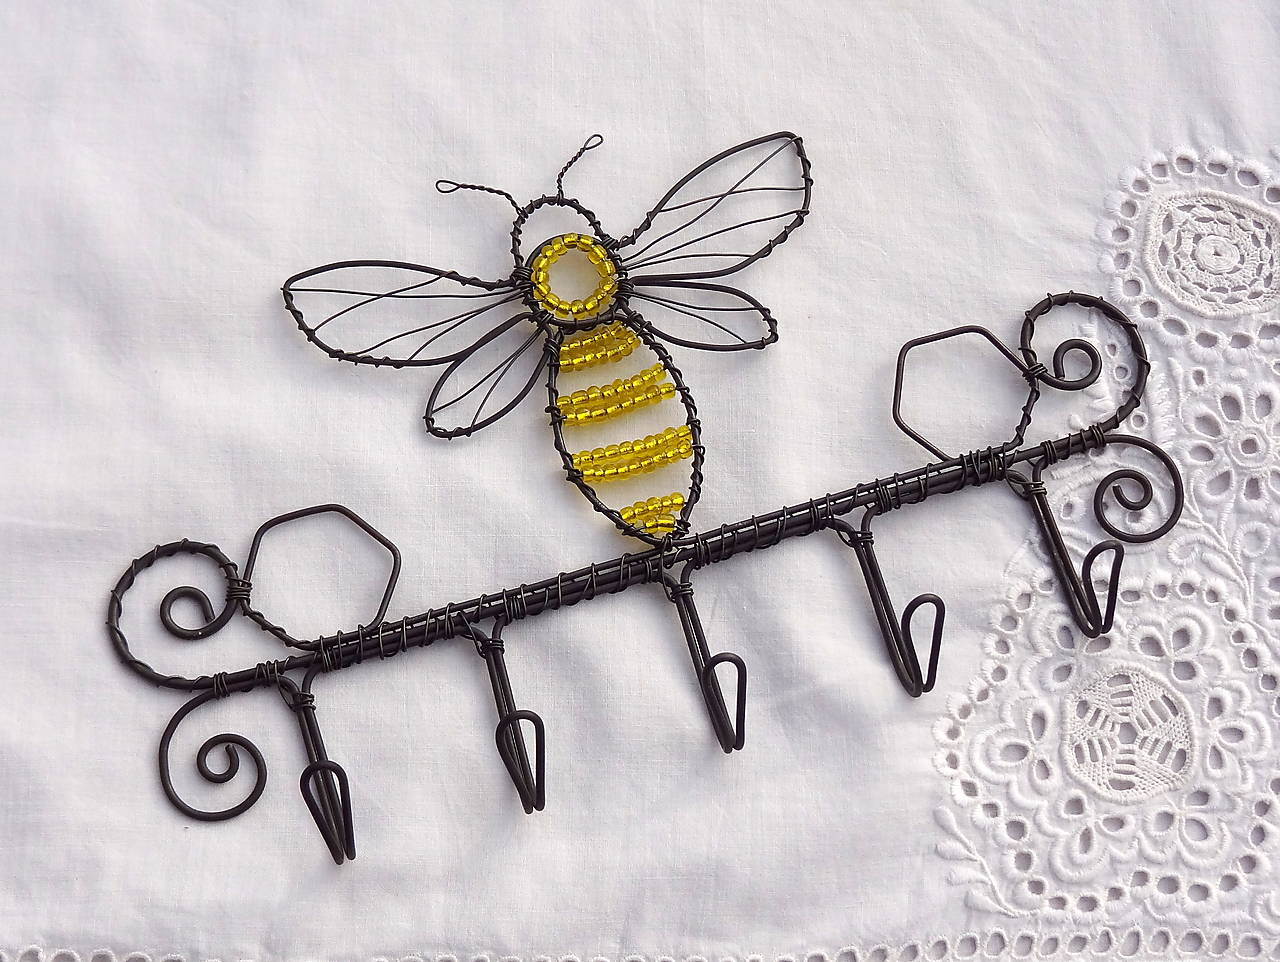 včela....vešiak na kľúče